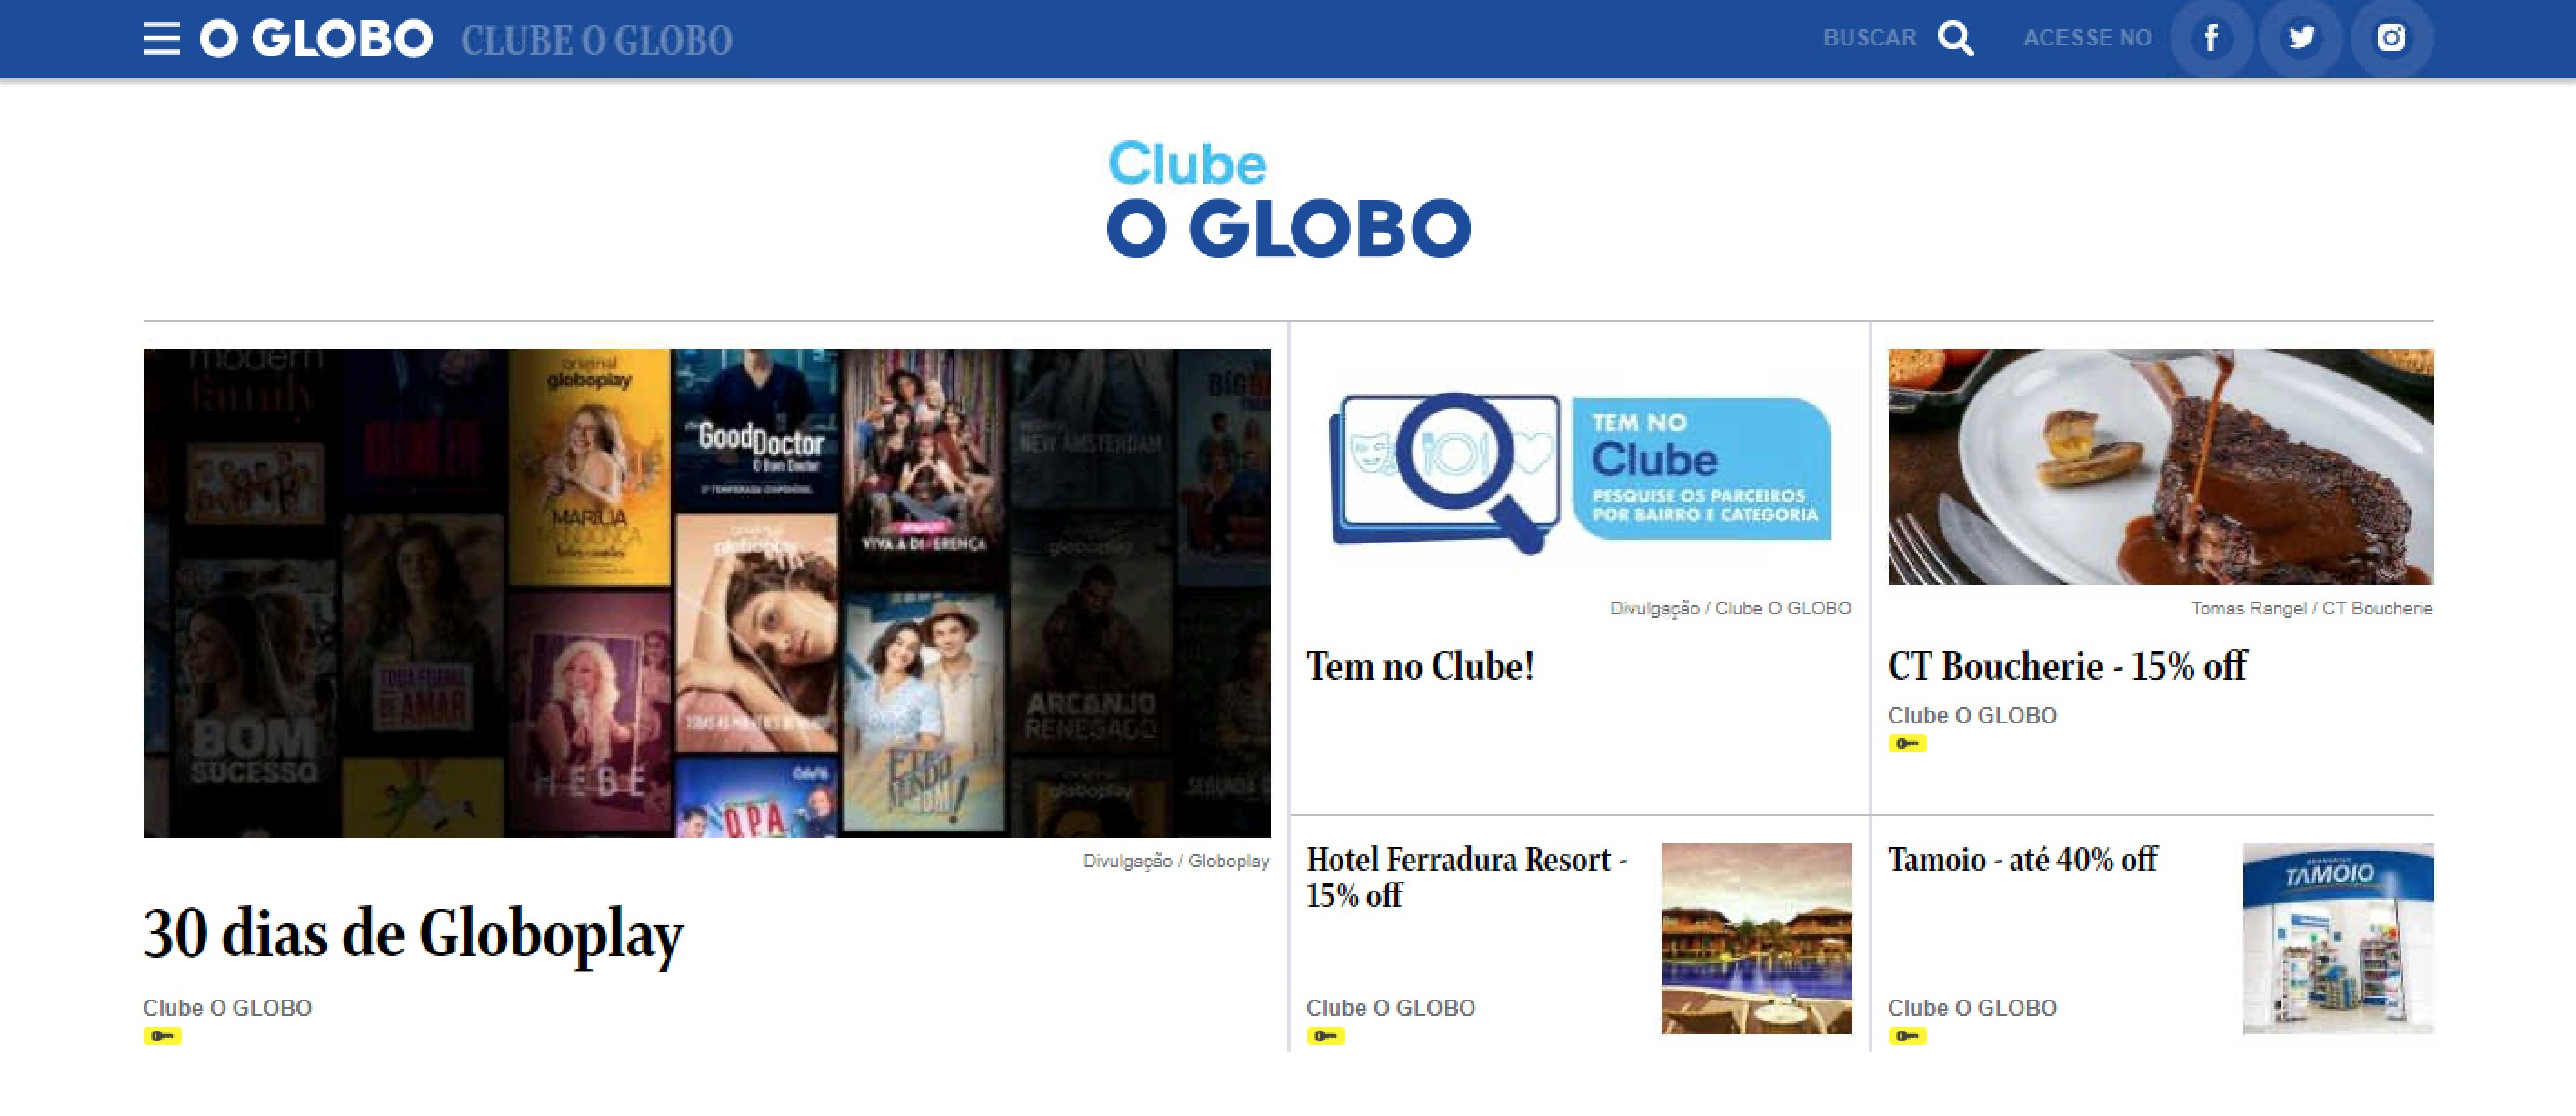 Confira o novo site do Clube O GLOBO